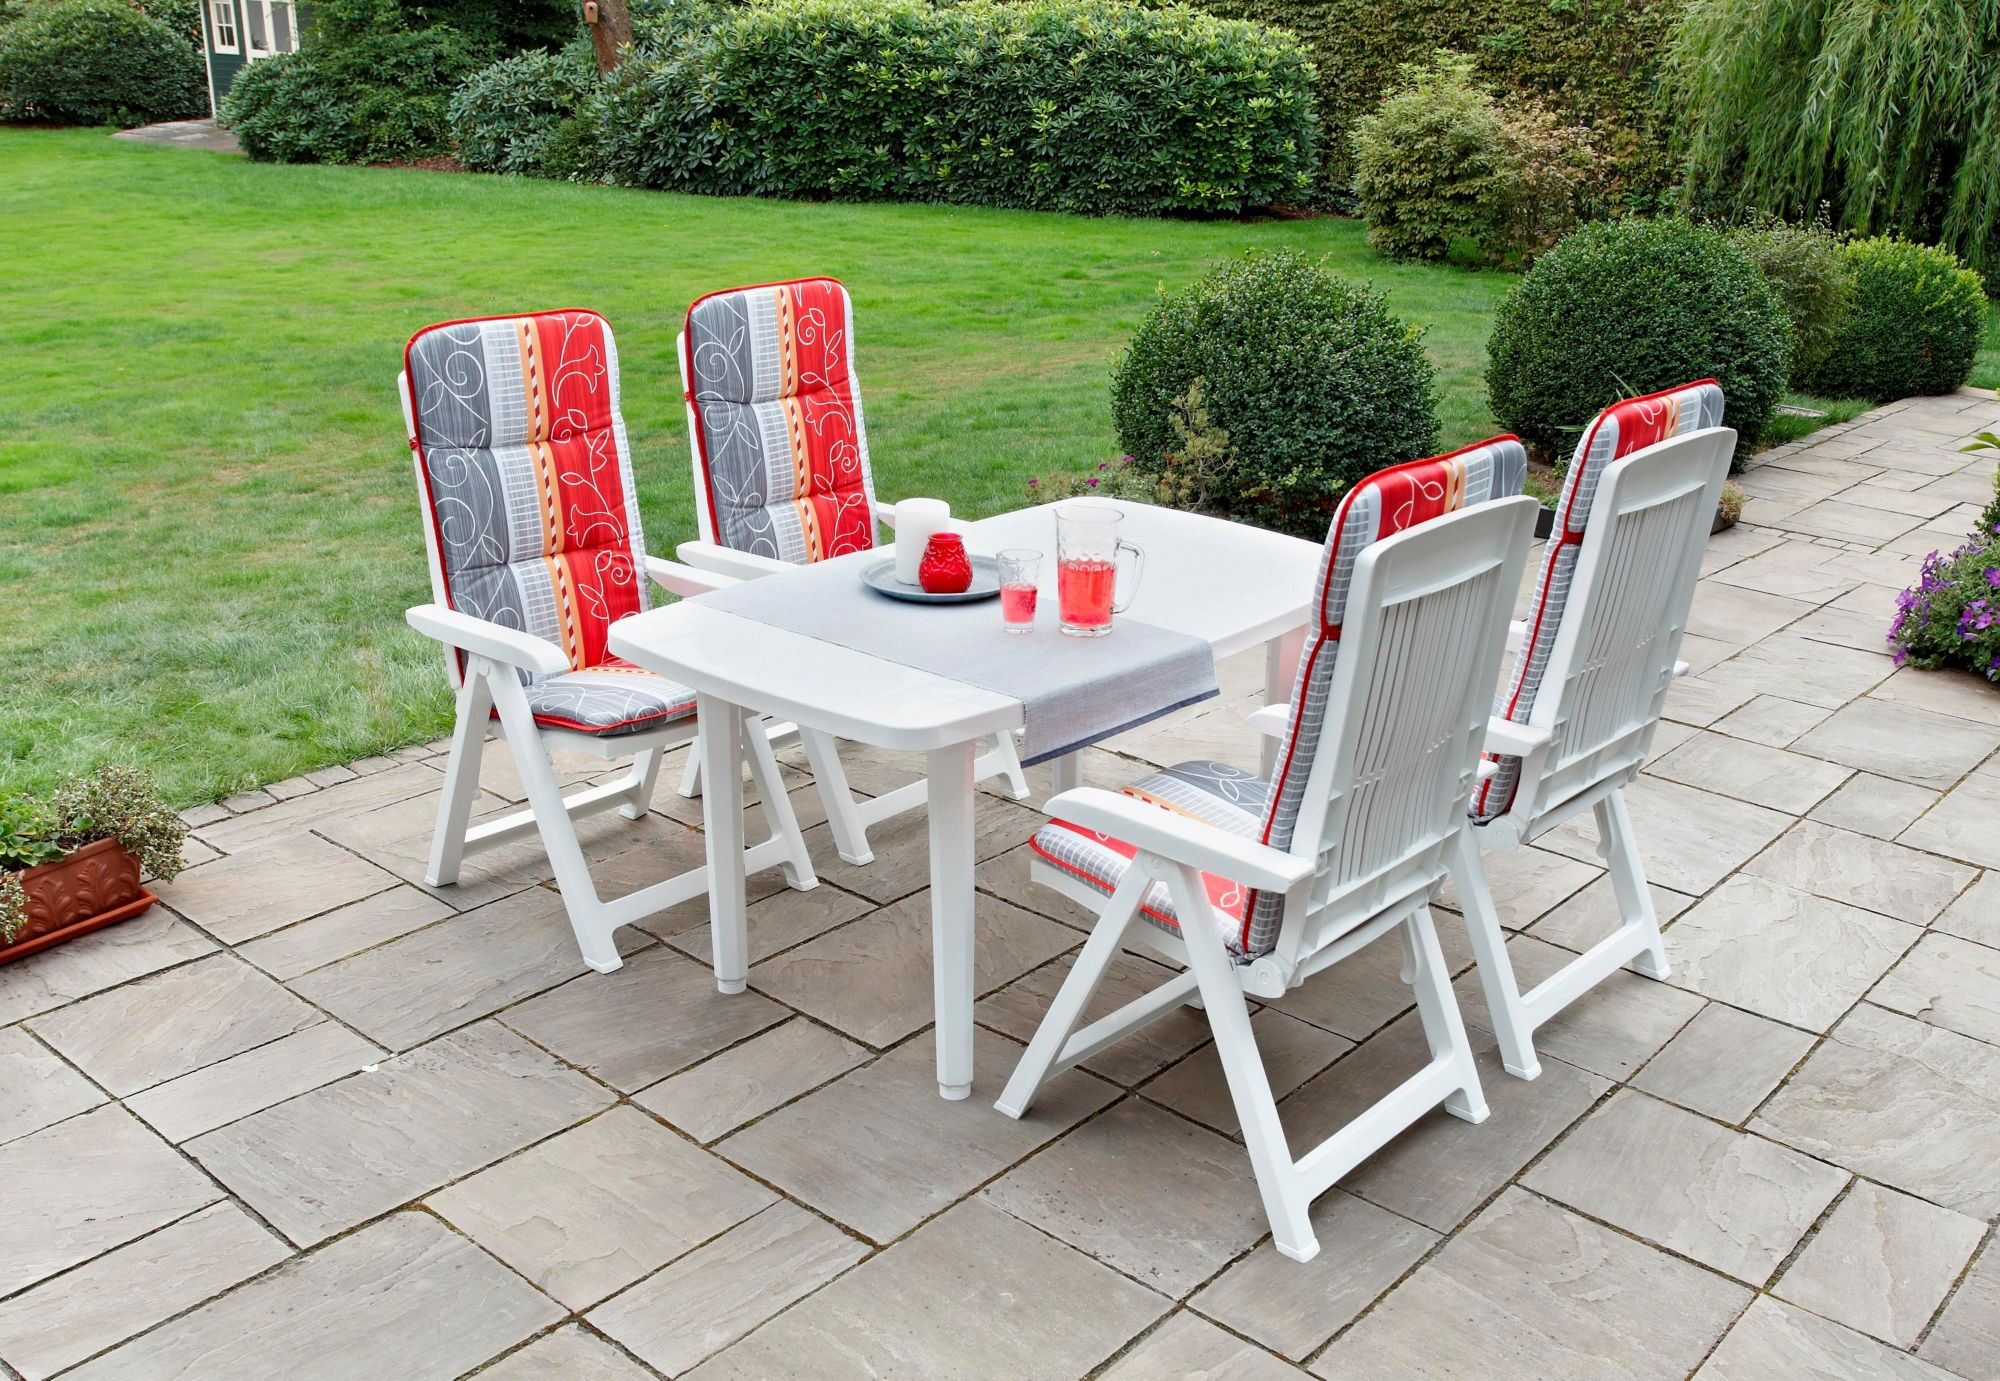 BEST Best 9-tgl. Gartenmöbelset »Kopenhagen«, 4 Sessel,Tisch 140x85 cm,Kunststoff,weiß,inkl. Auflagen,klappbar